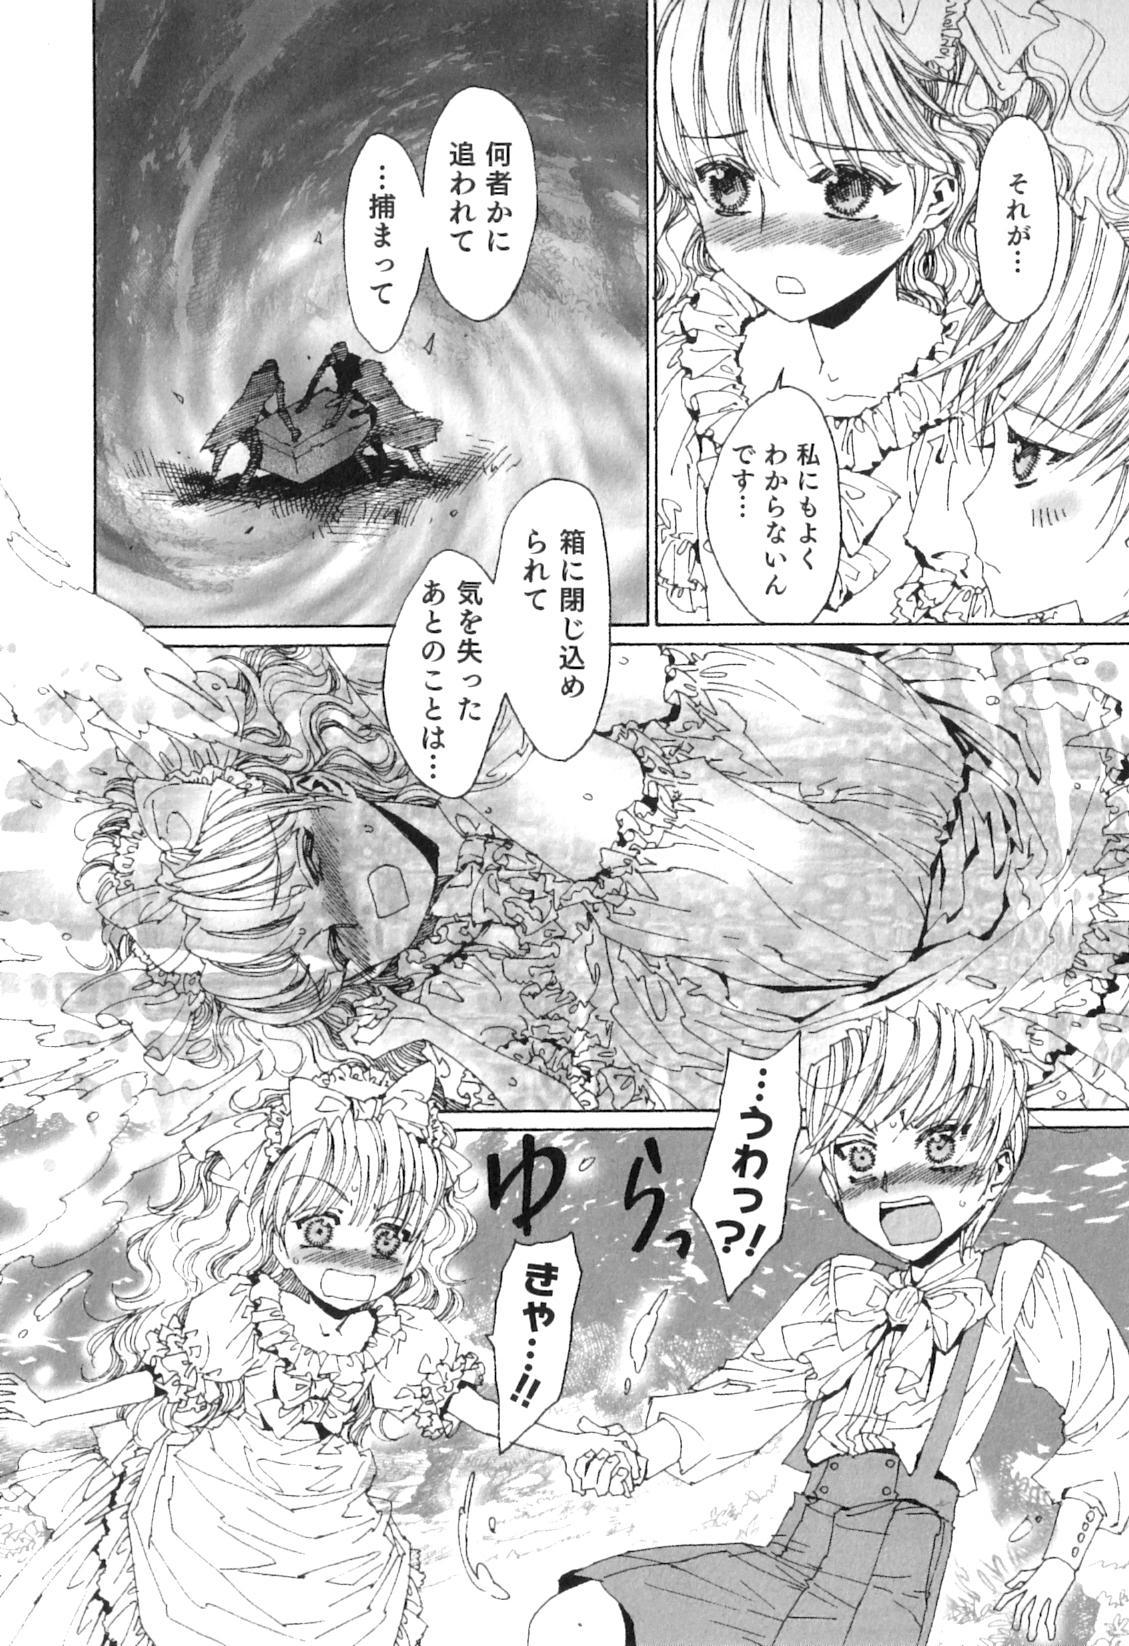 Yuni-Hapi 130